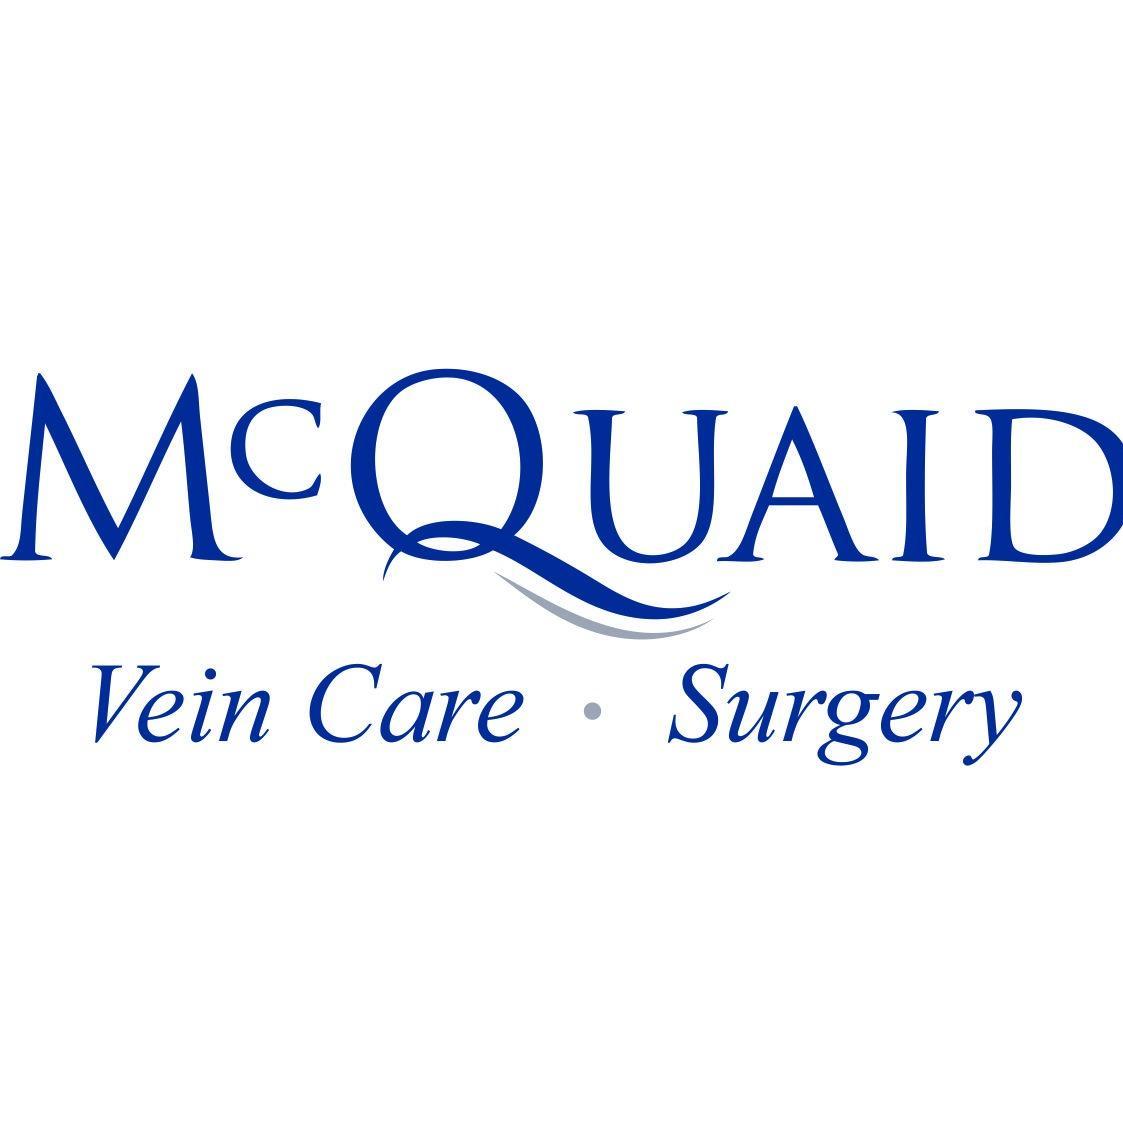 McQuaid Vein Care & Surgery